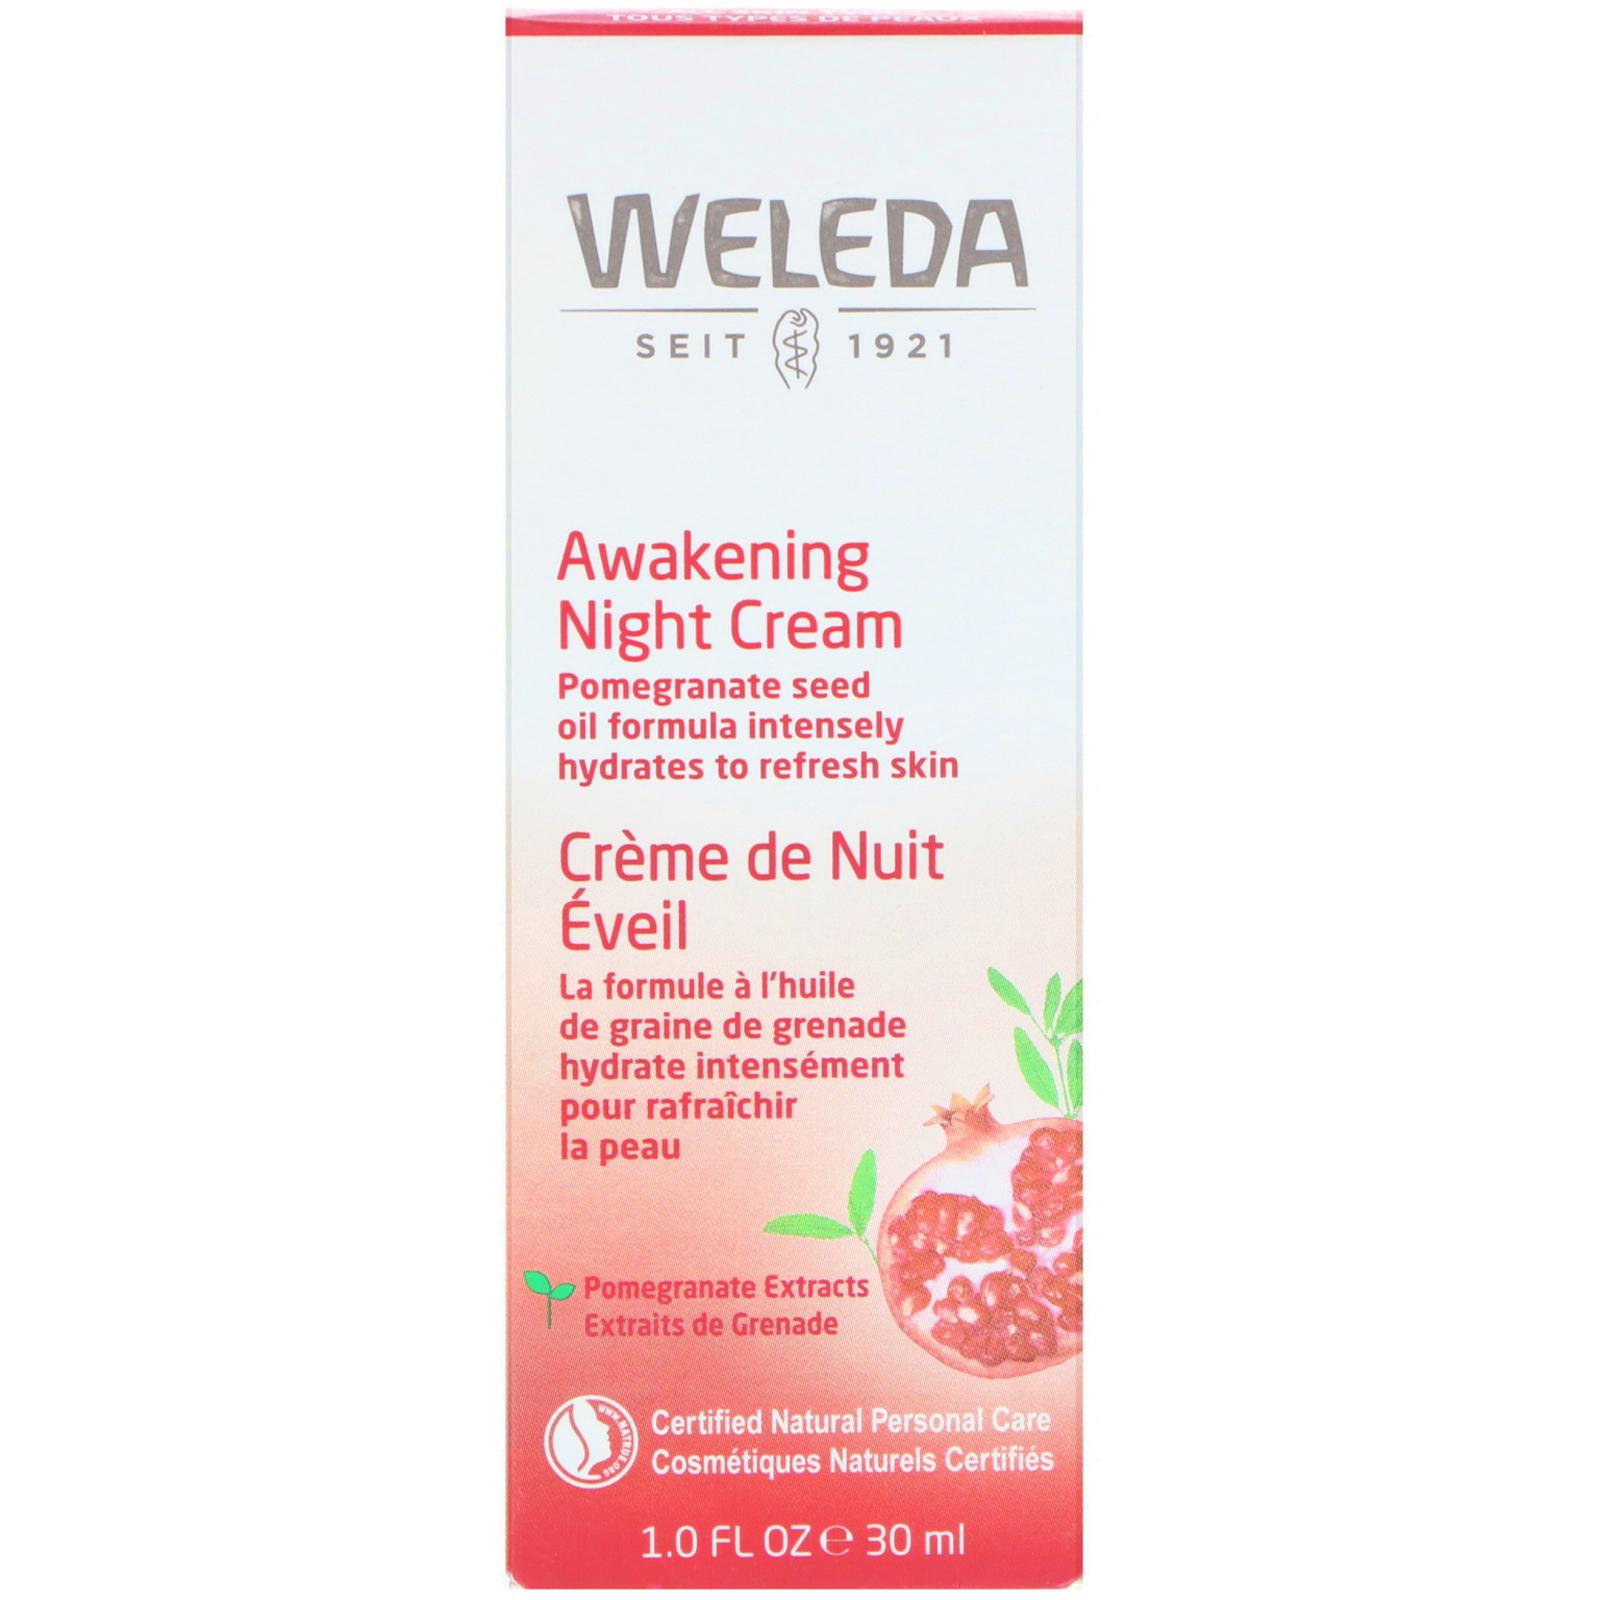 Weleda - Pomegranate Firming Night Cream - 30ml/1oz Carmex Value Pack Lip Balm, Original Flavored - 3 Ea, 6 Pack